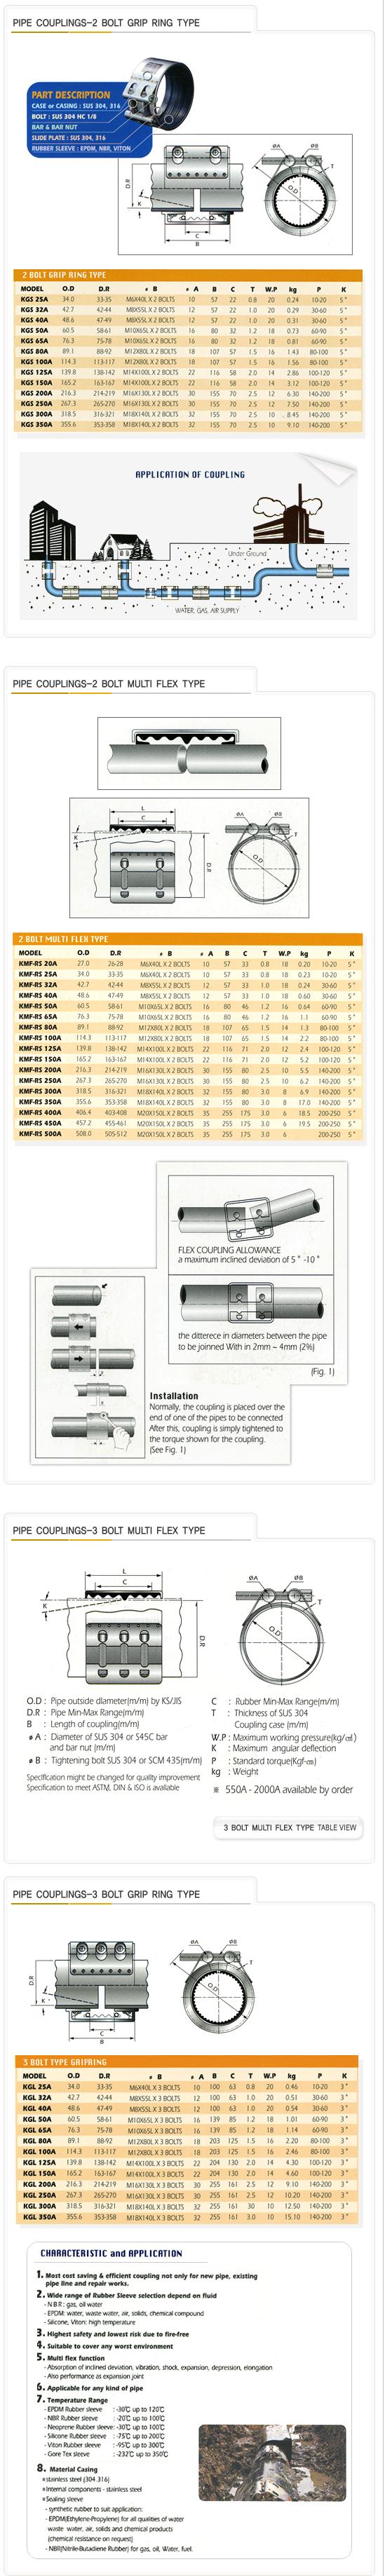 Kukil Inntot Medium Pressure Pipe Couplings